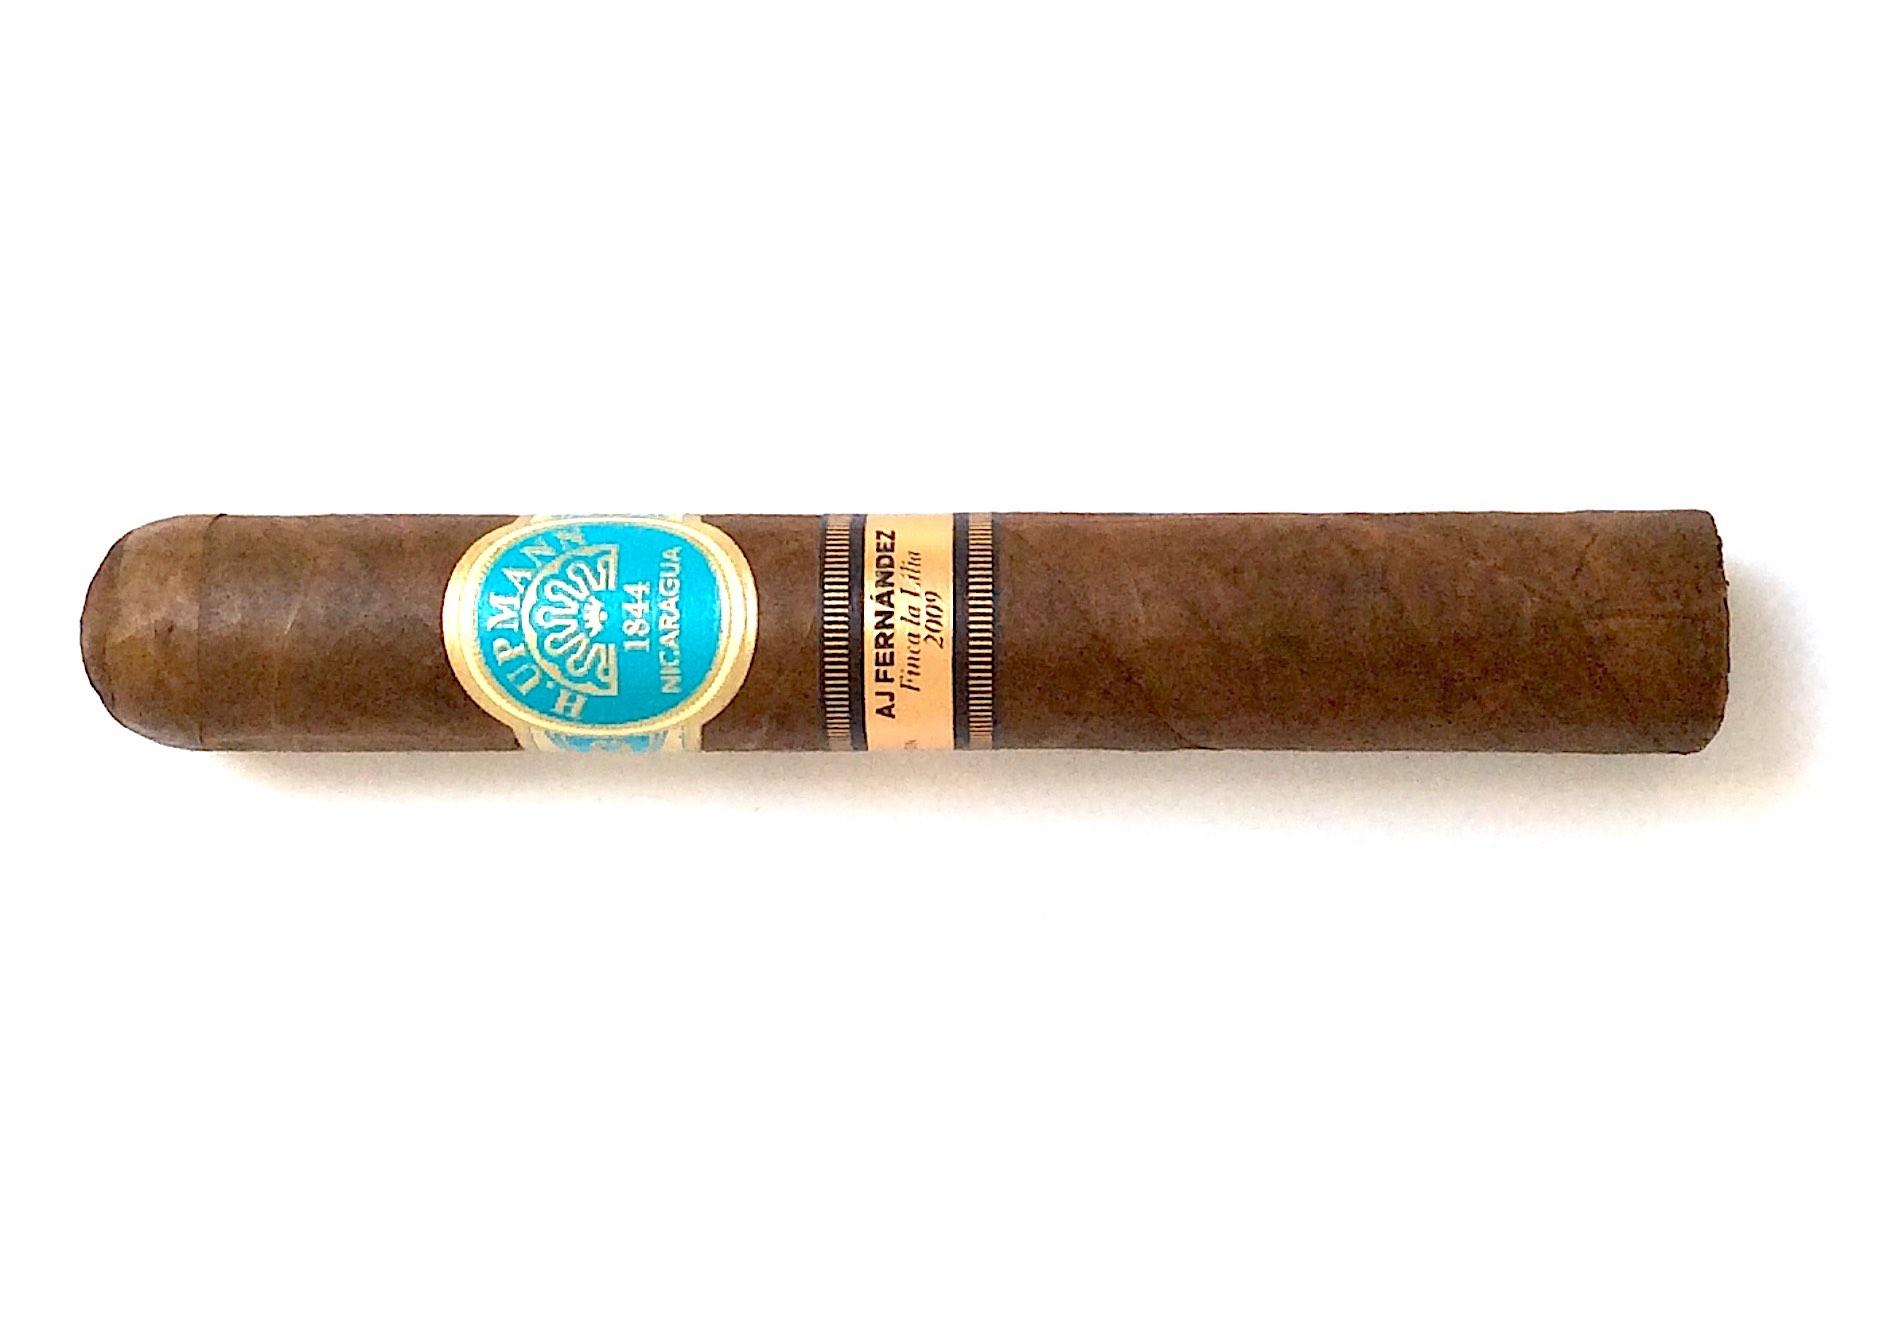 Cigar Review: H. Upmann Nicaragua by AJ Fernandez Finca La Lilia 2009